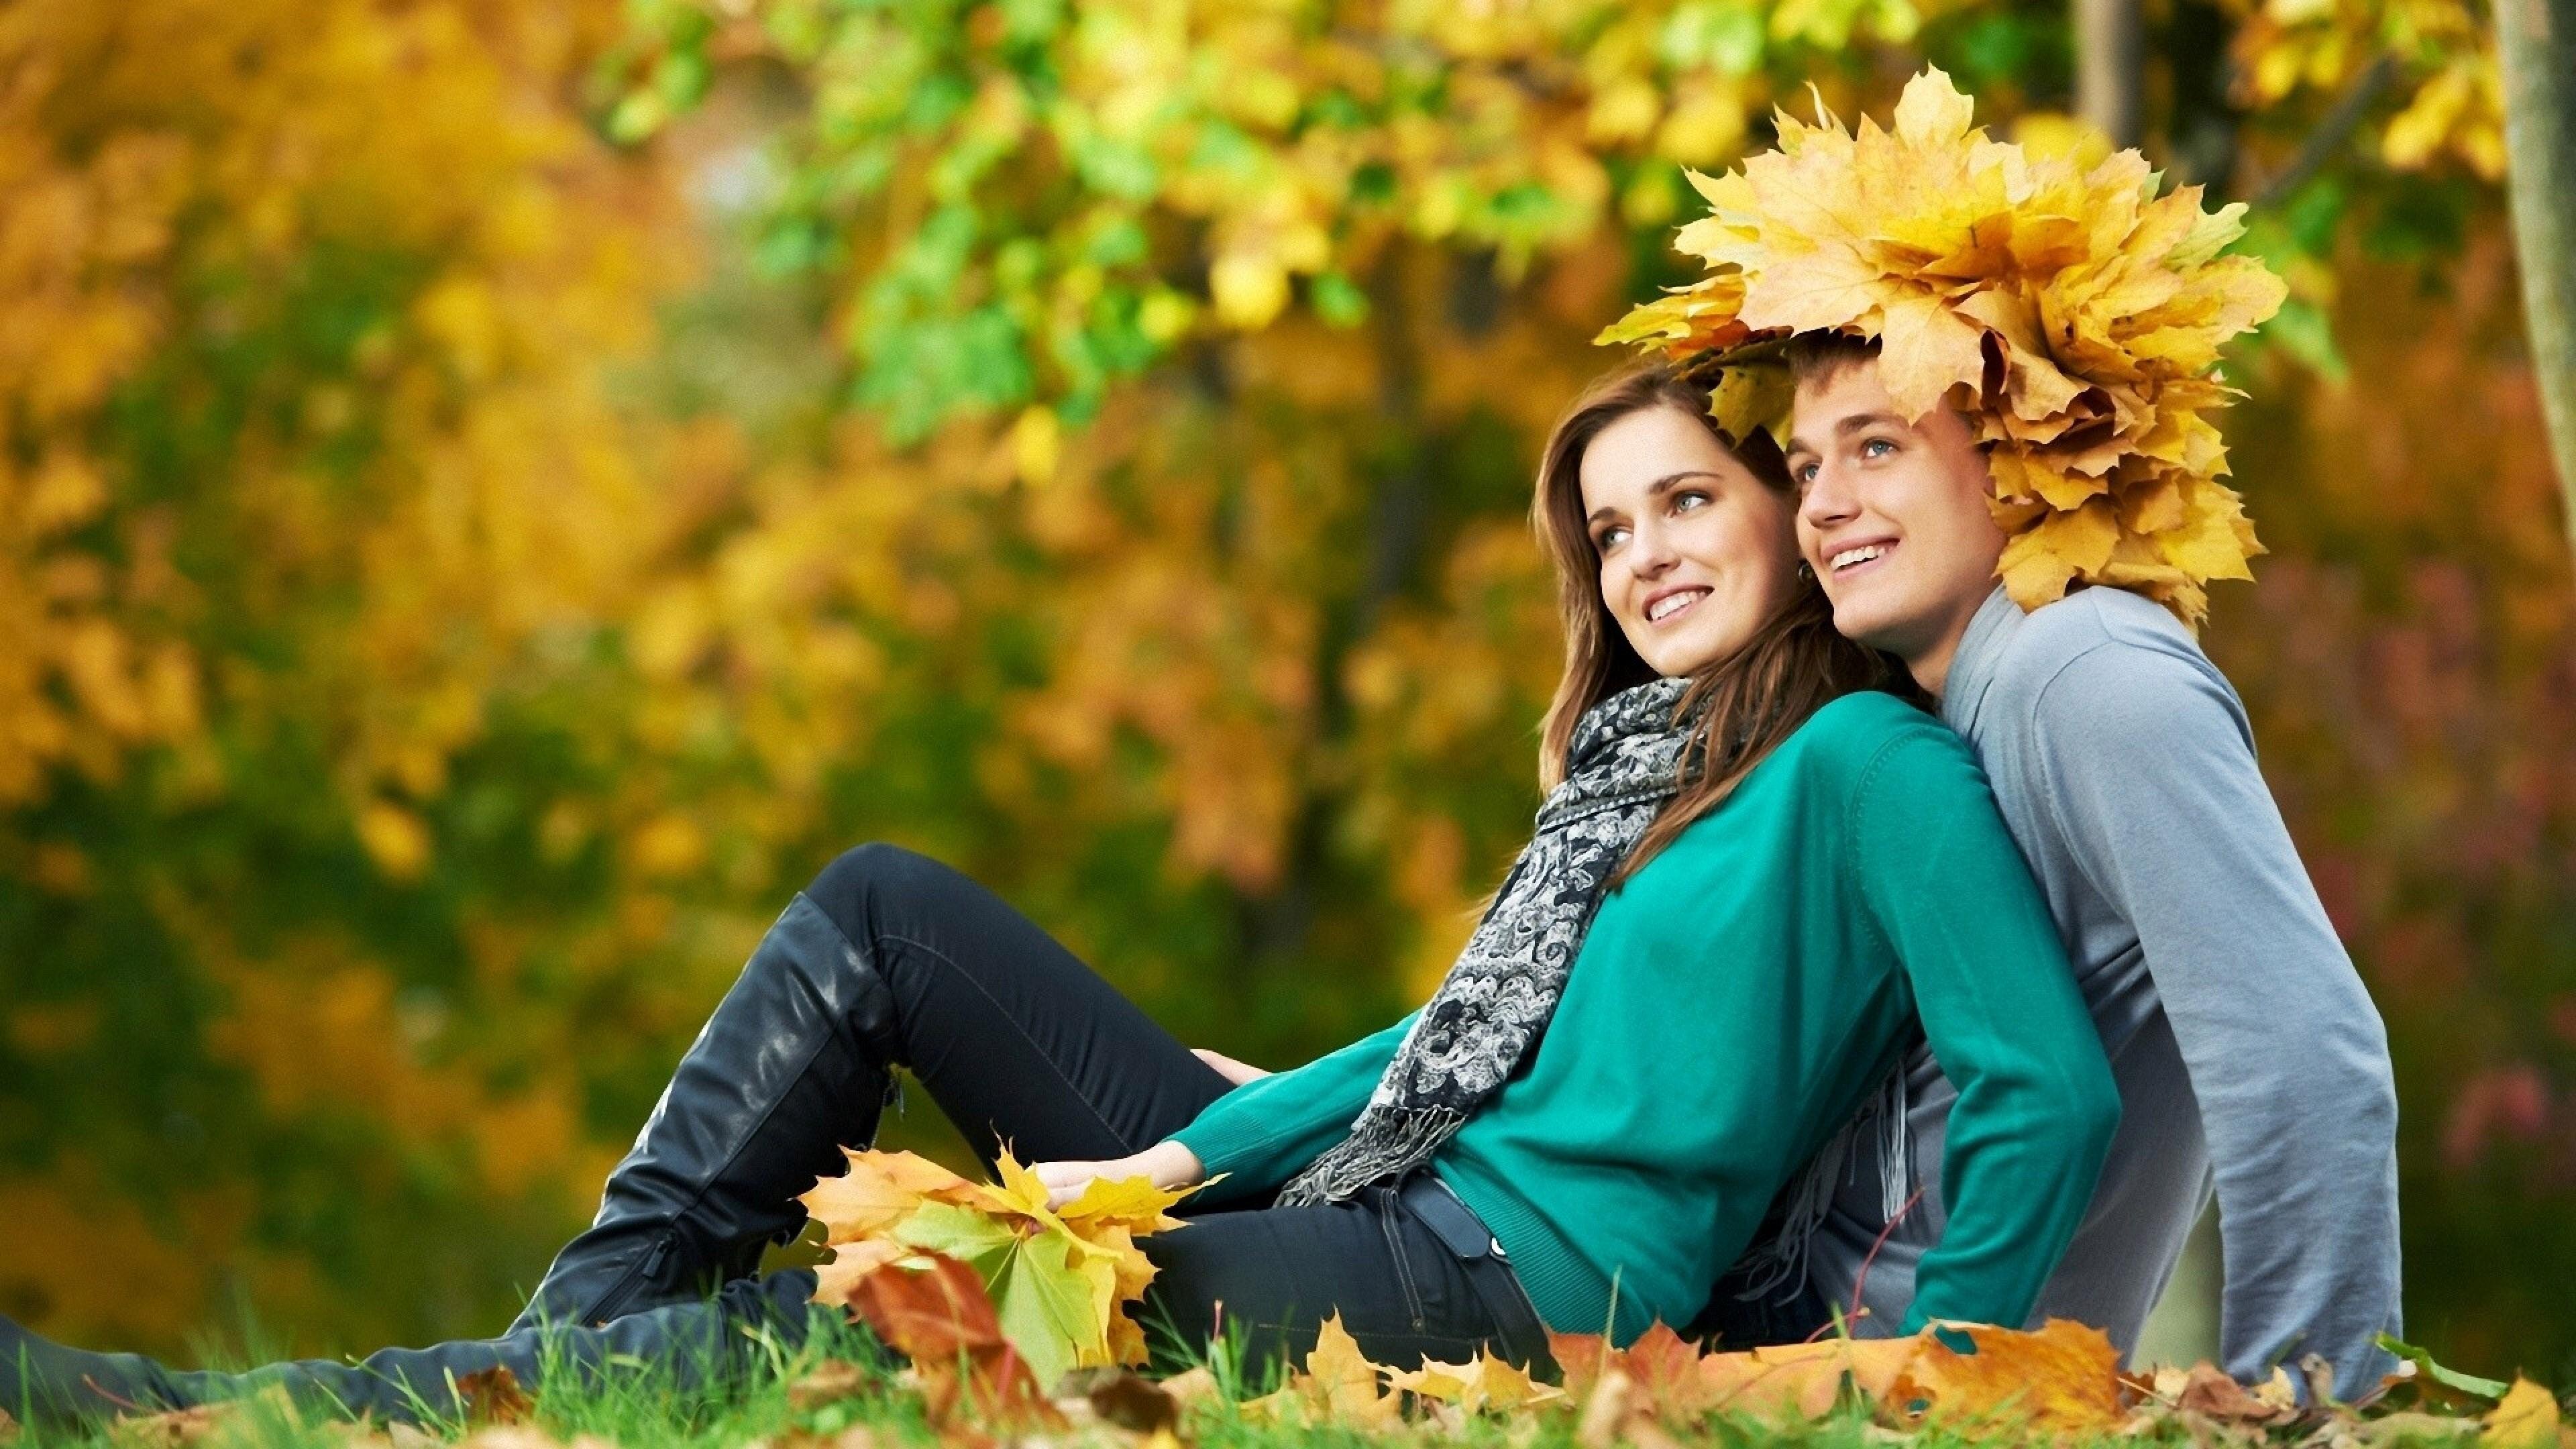 Beautiful Romantic Couple in Garden 4K Wallpaper | HD ...